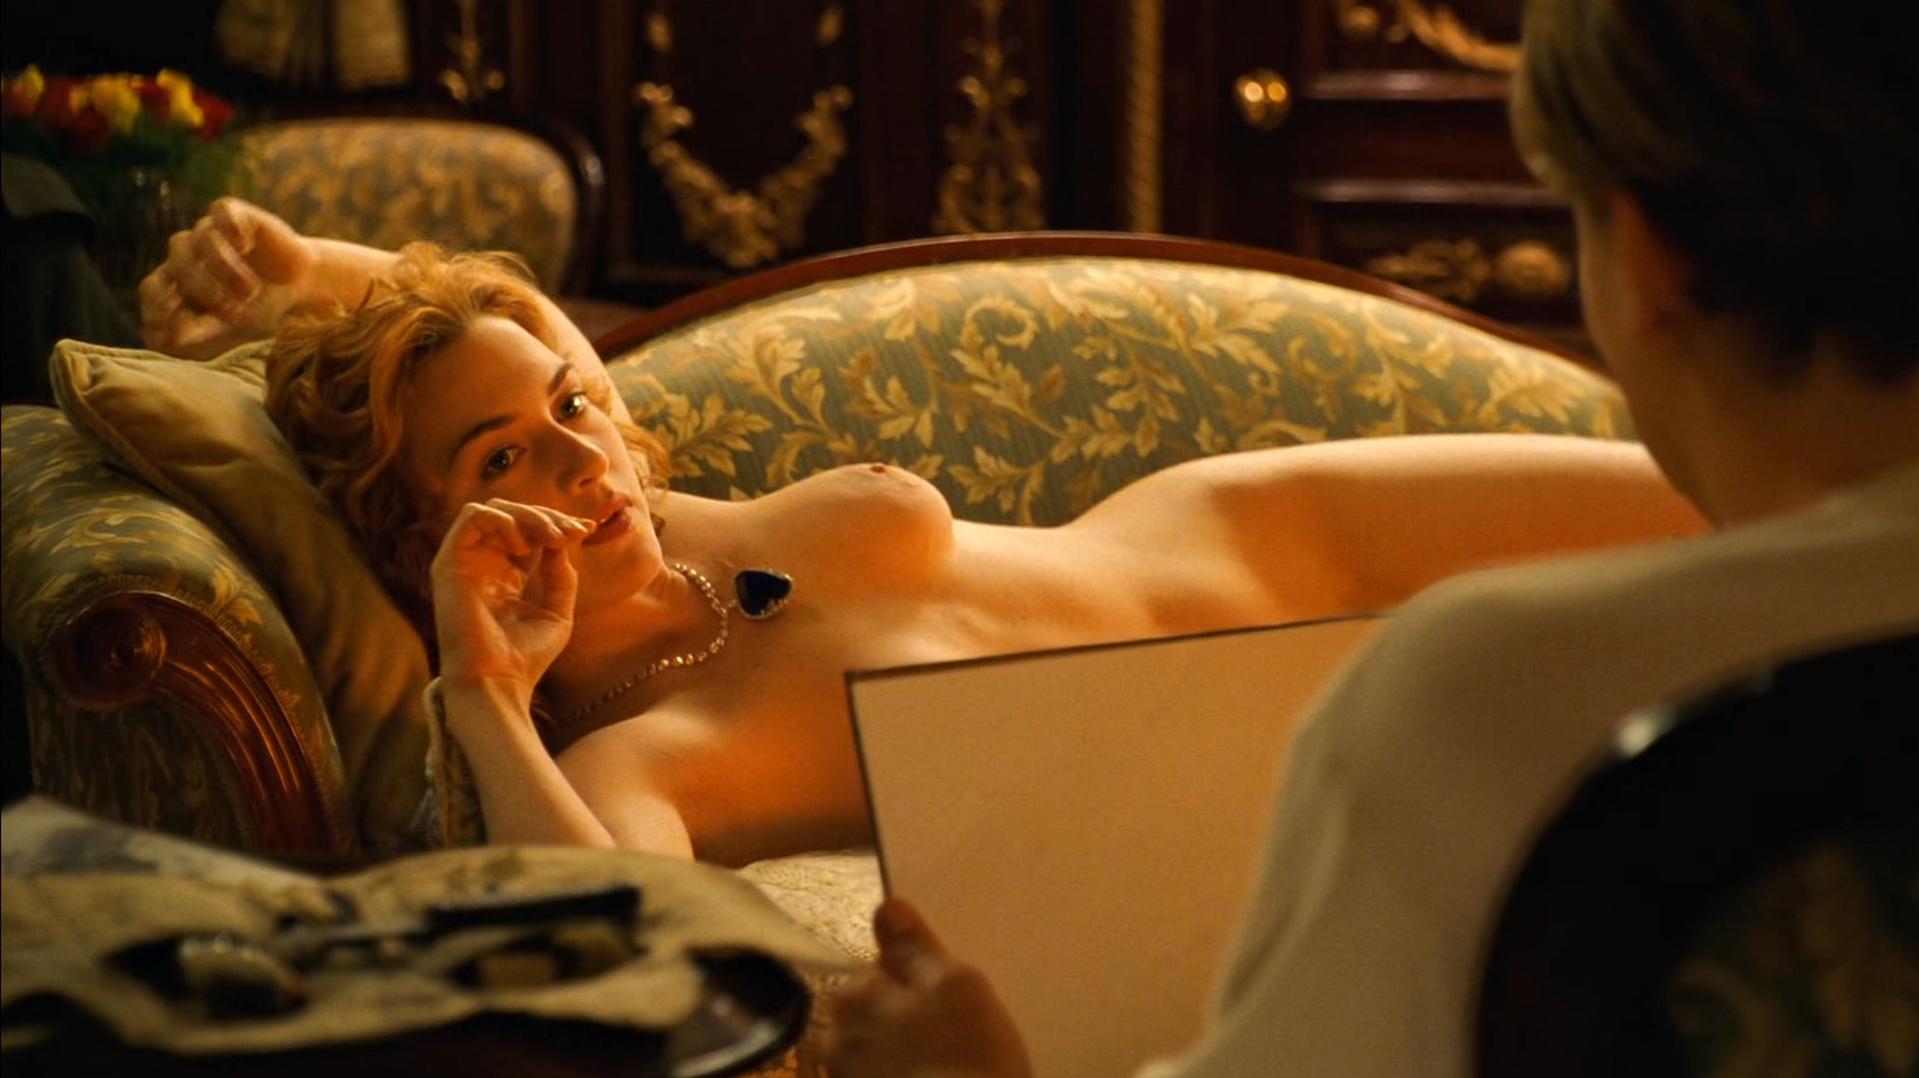 Kate winslet titanic sex scene - Excellent porn